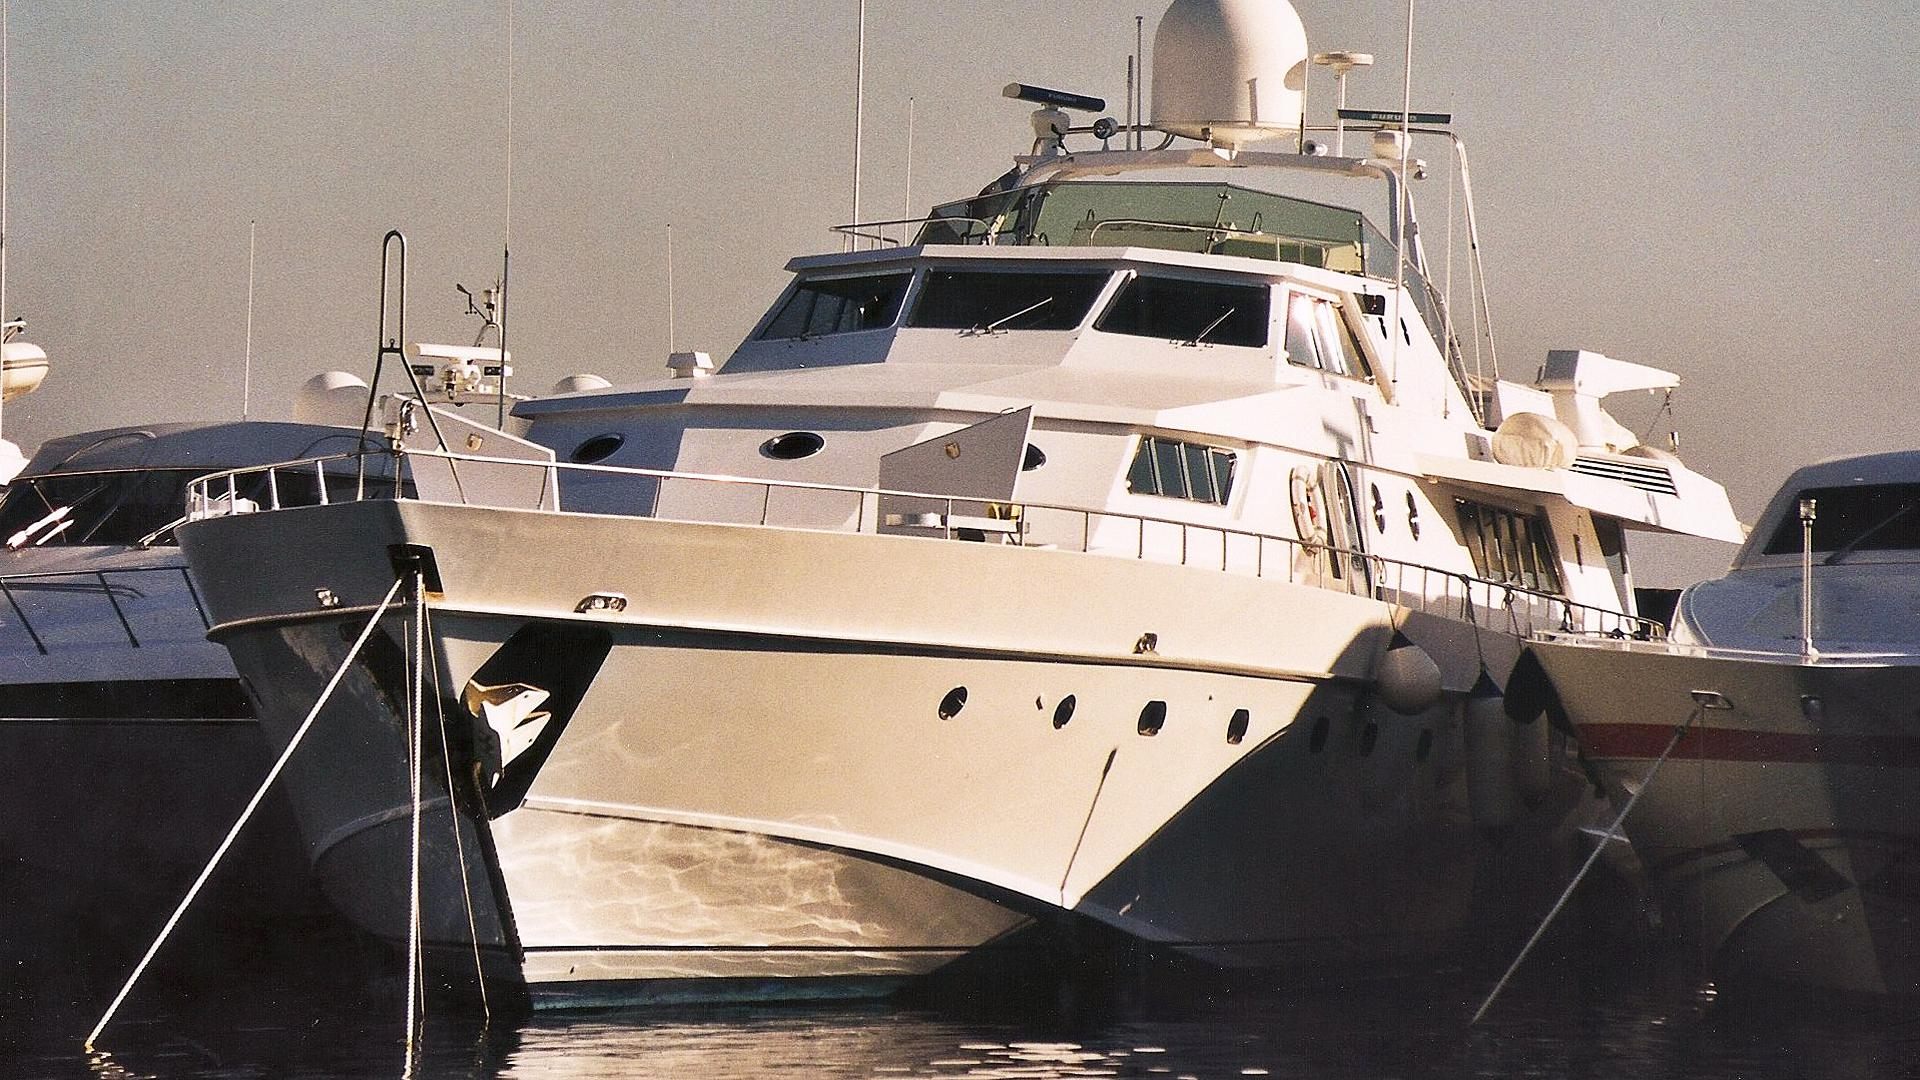 illyria-motor-yacht-cnl-admiral-36m-1982-bow